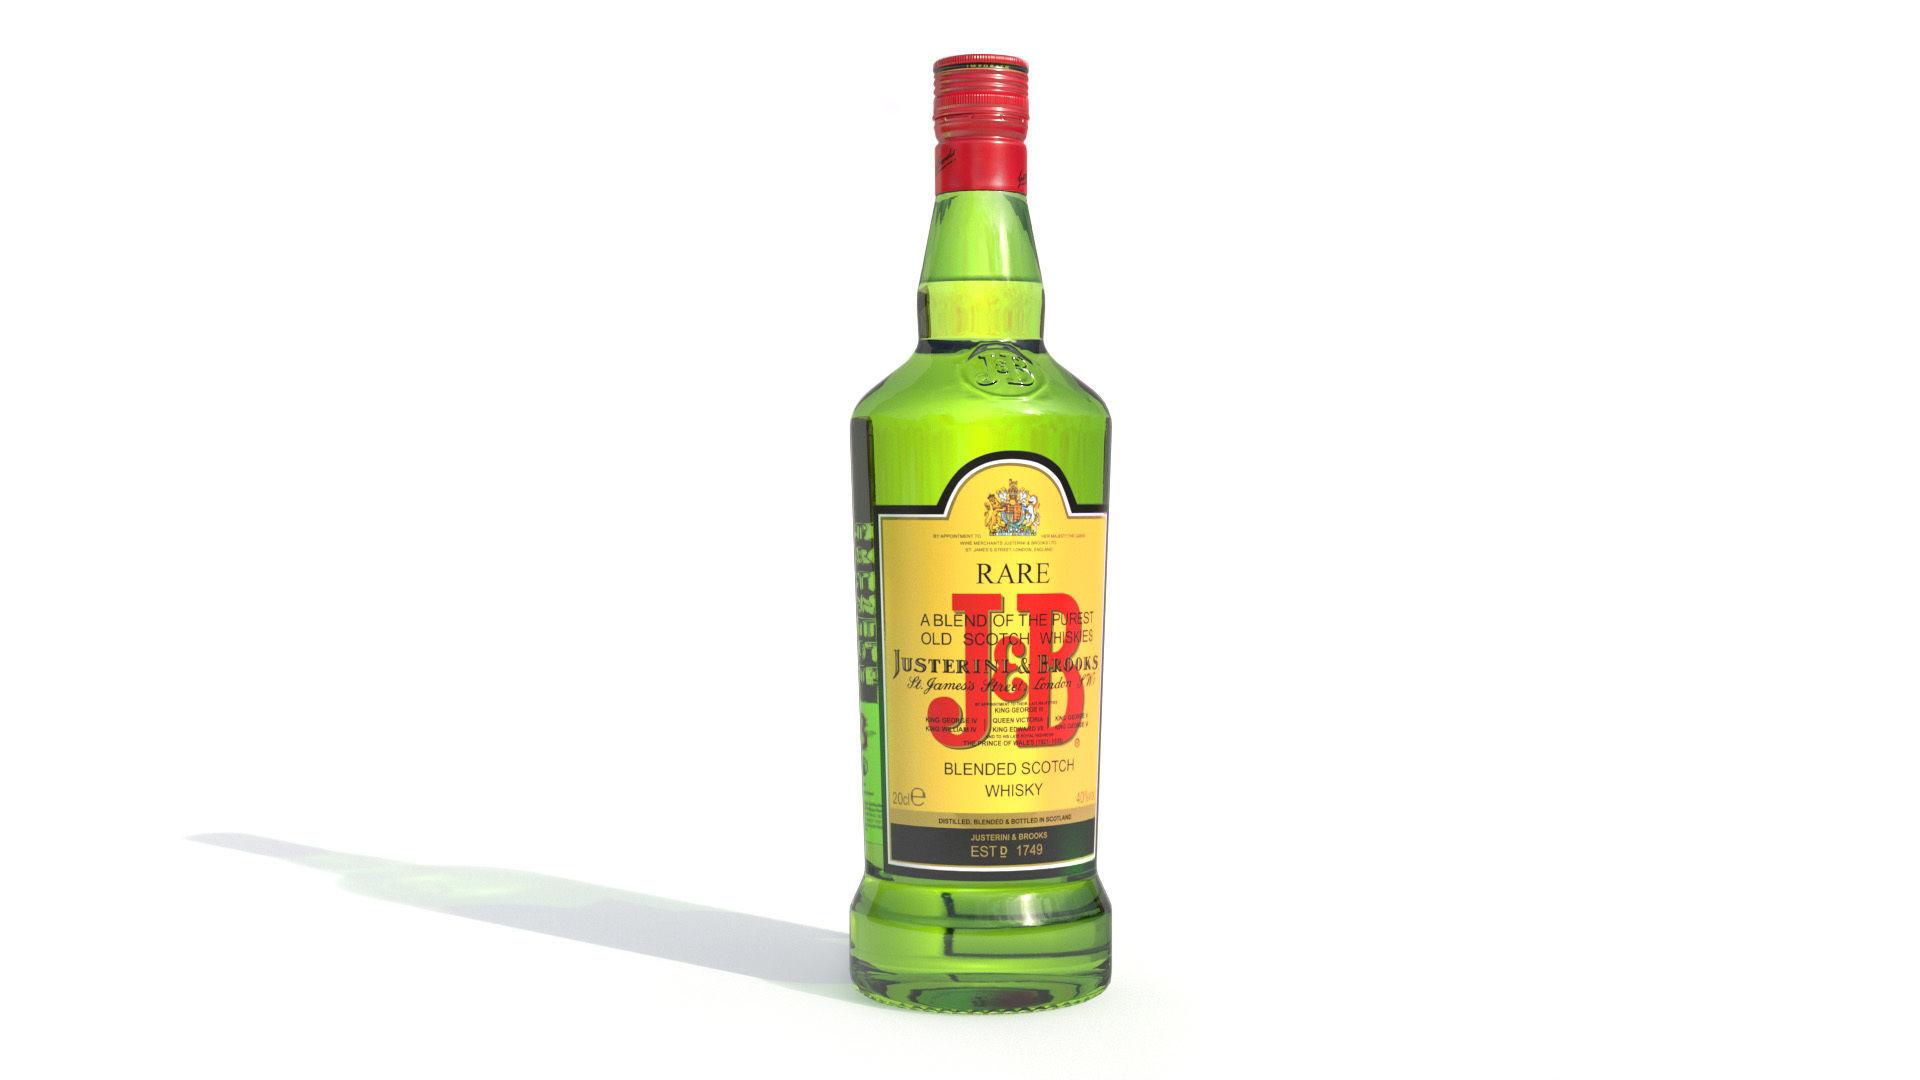 JB alcohol whiskey Bottle